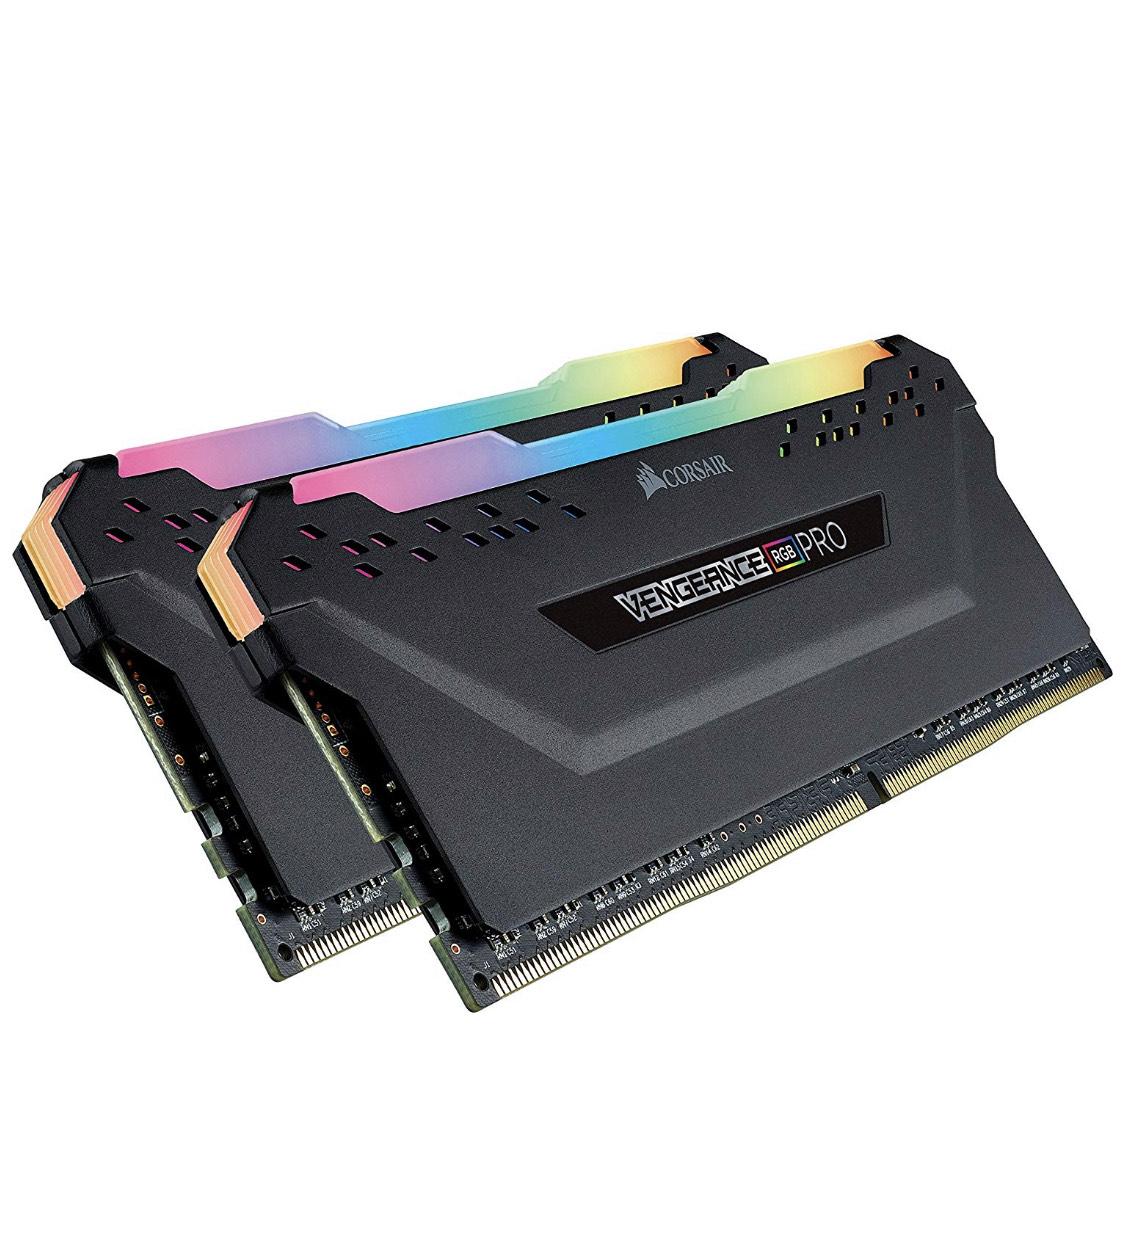 Corsair Vengeance RGB PRO 16 GB (2 x 8 GB) DDR4 3200 MHz at Amazon for £82.98